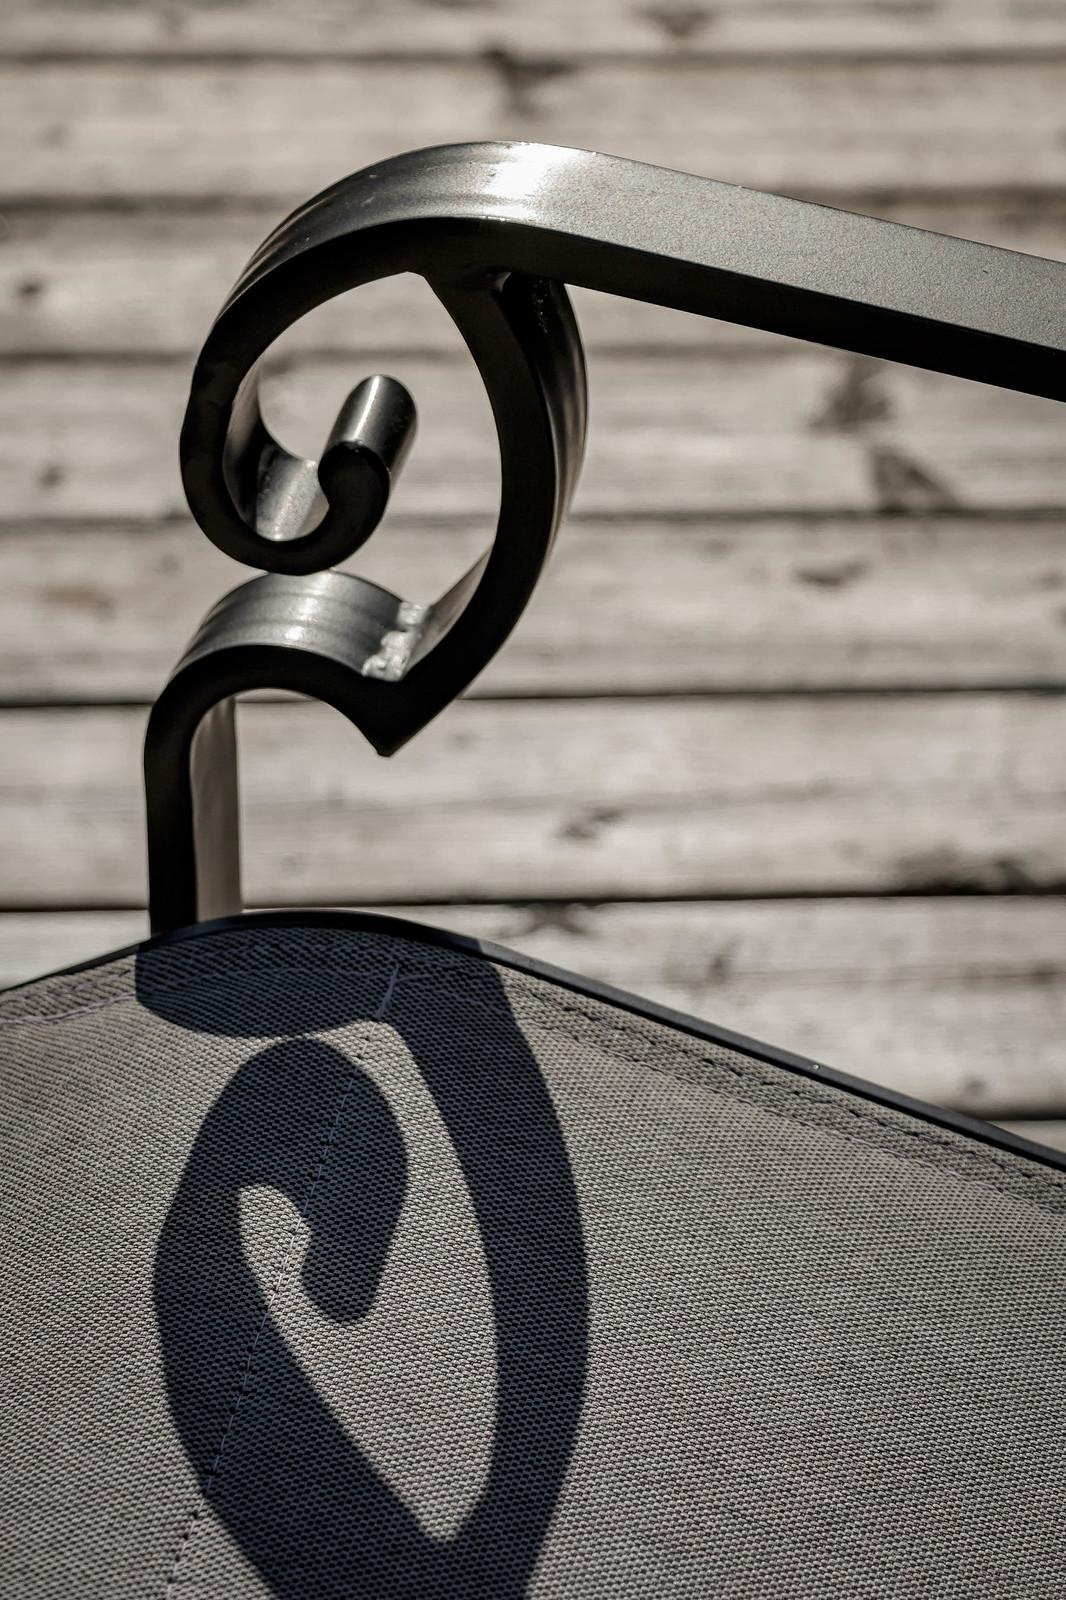 chair arm shadow